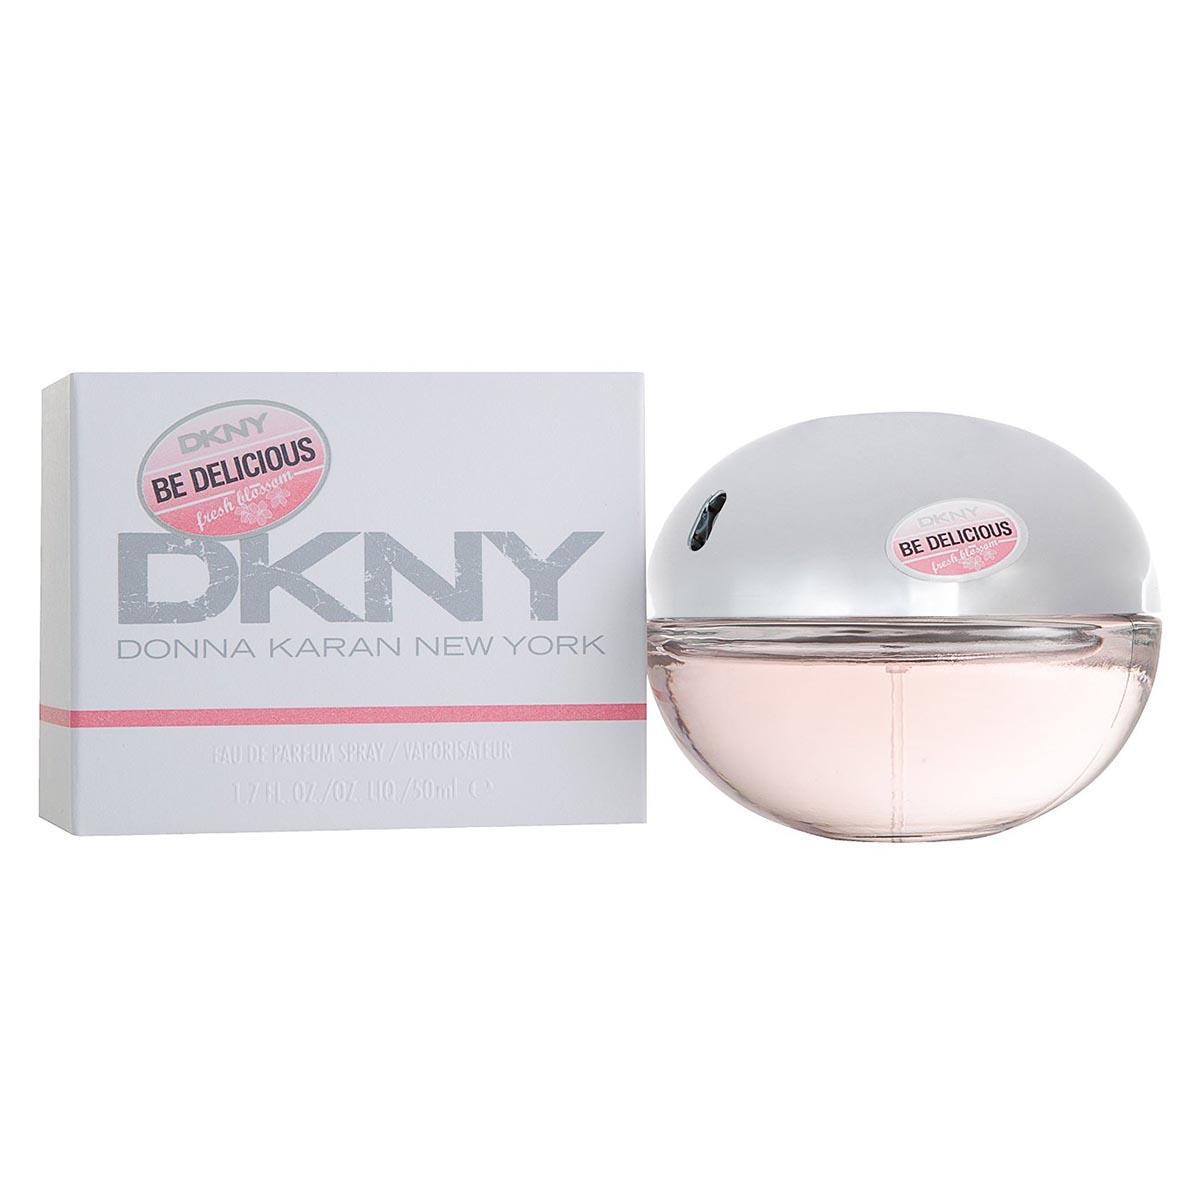 Dkny be delicious woman blossom eau de parfum 100ml vaporizador